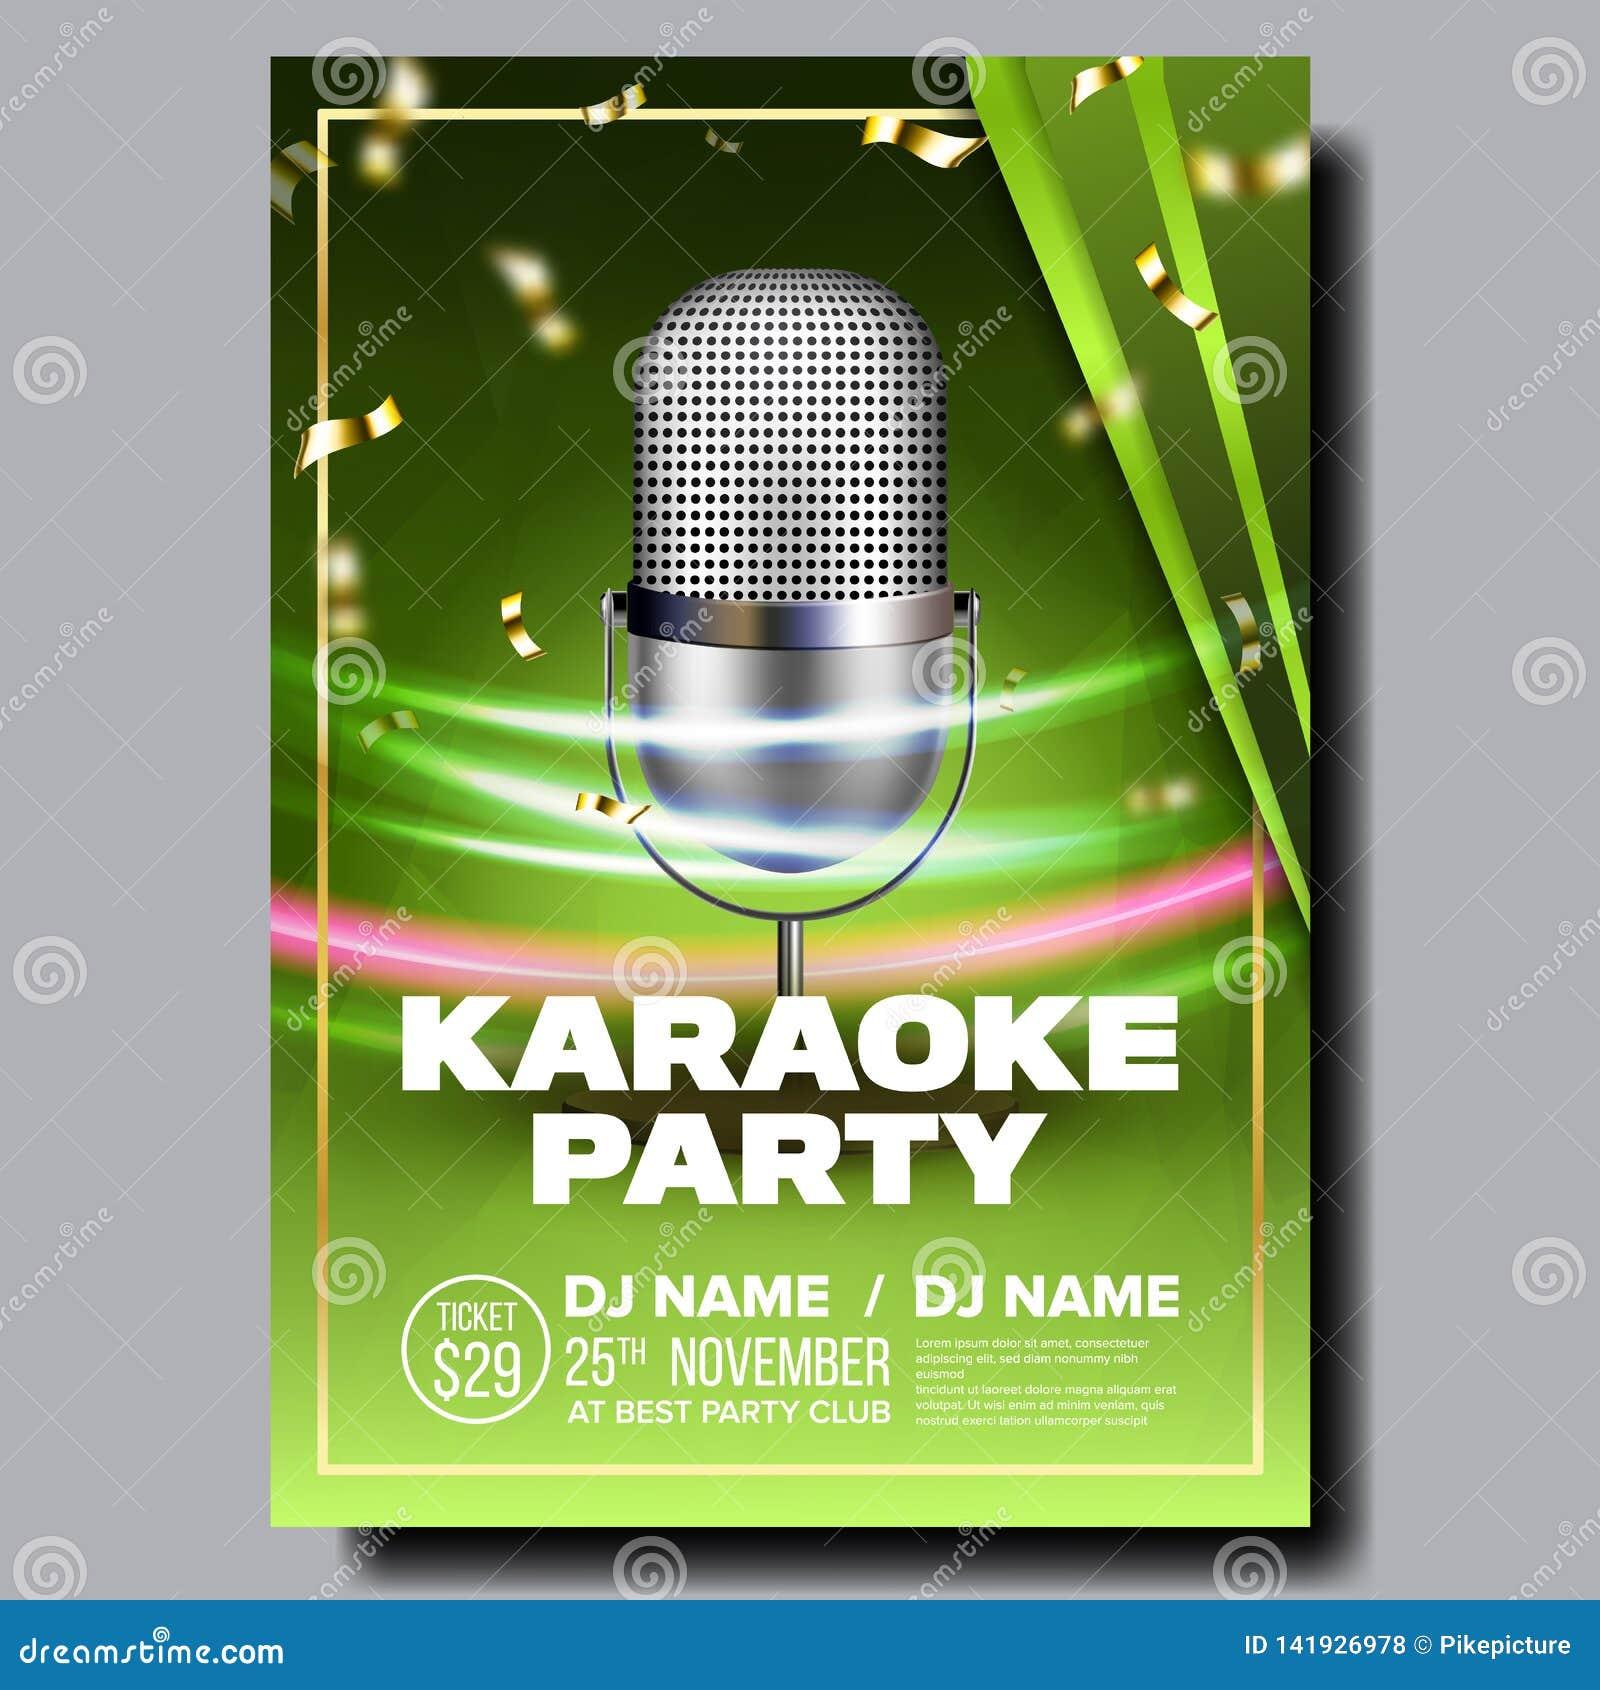 Karaoke Poster Vector  Vintage Karaoke Studio  Musical Record